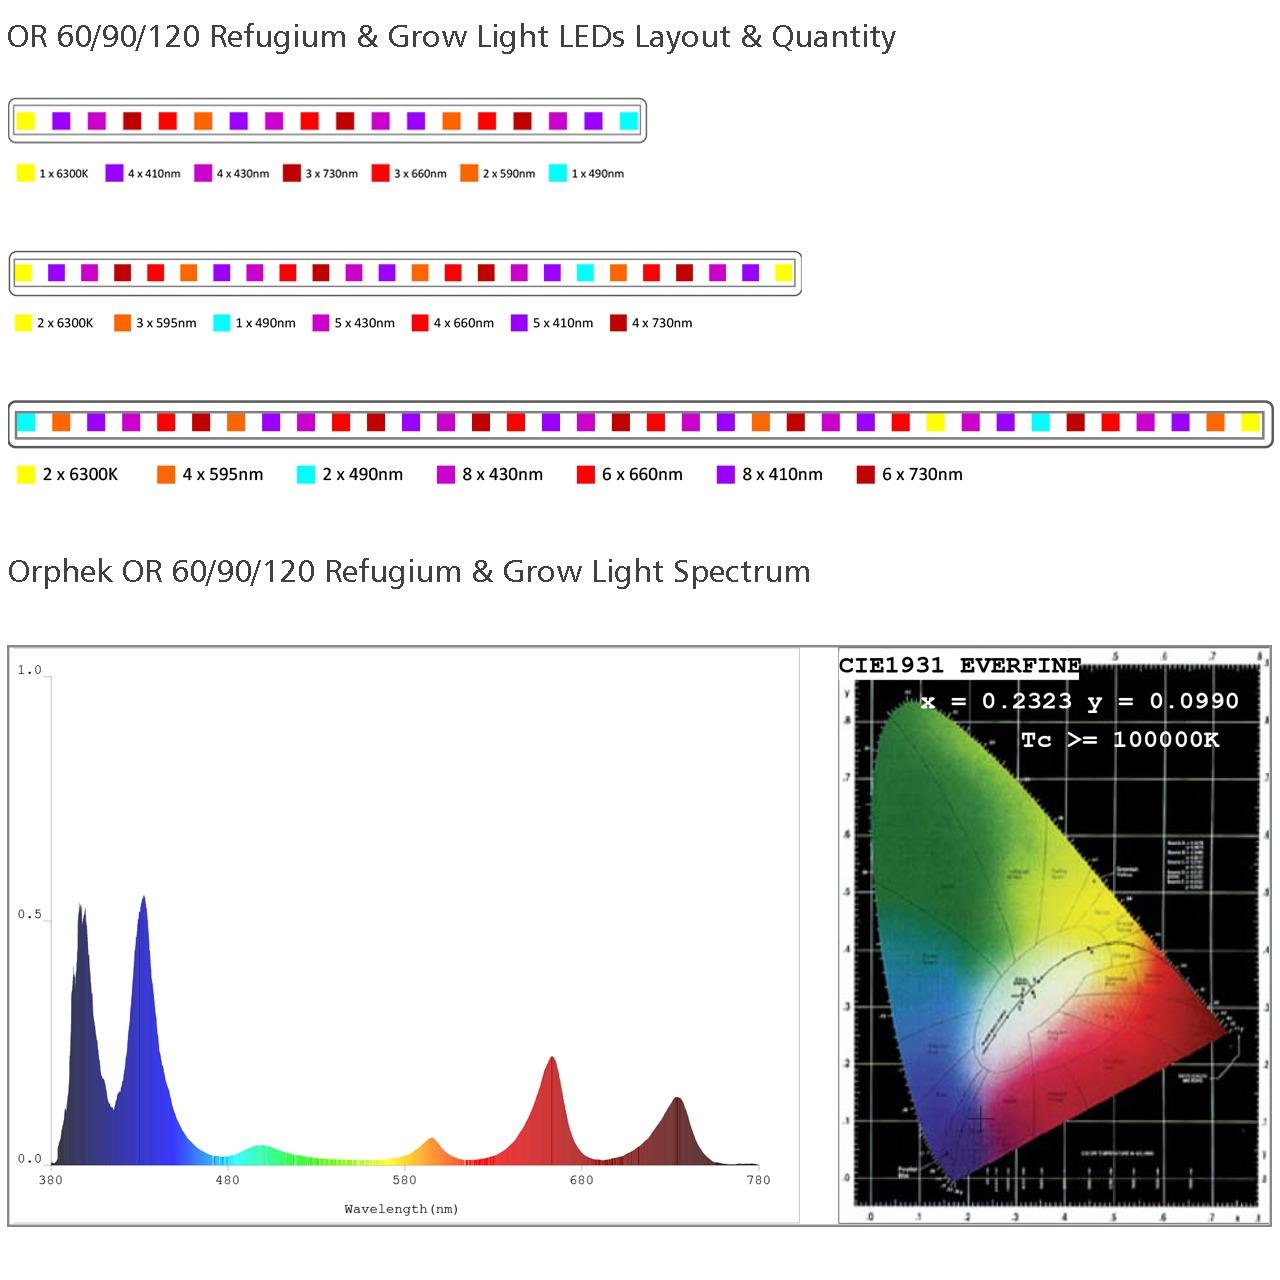 OR120-90-60-Refugium-Grow-Light-led-layout-and-spectrum.jpg